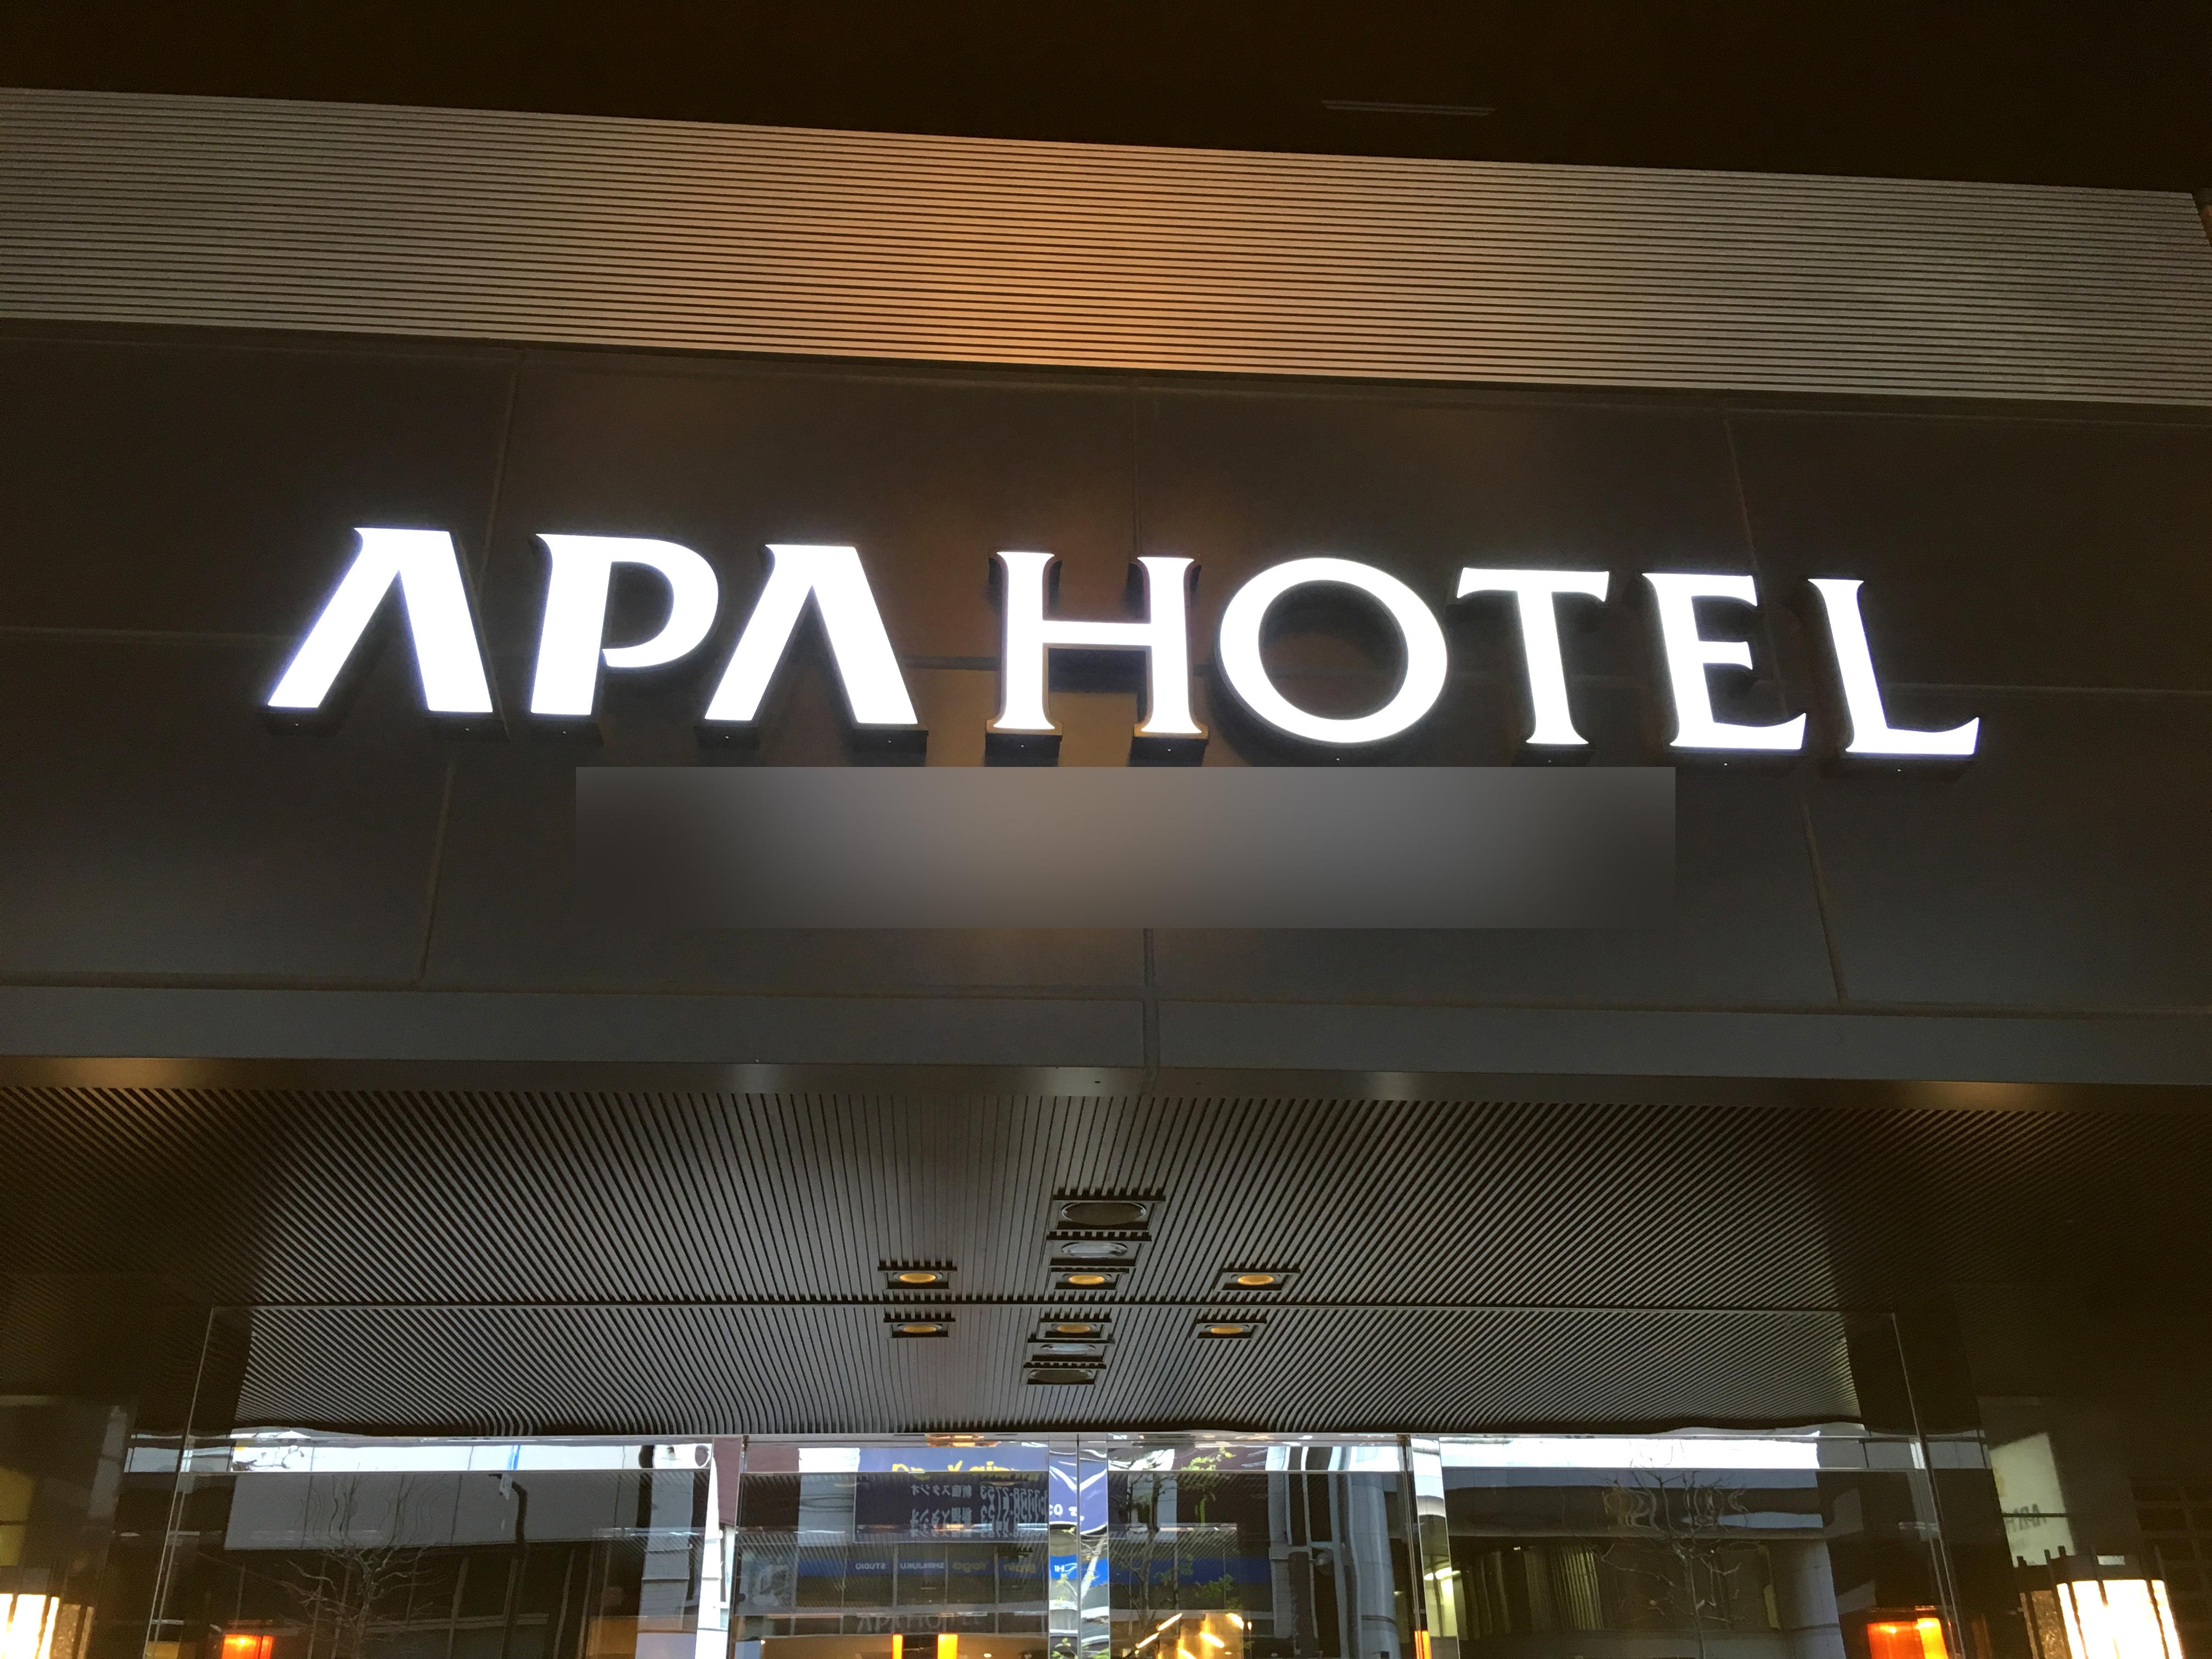 apahotel